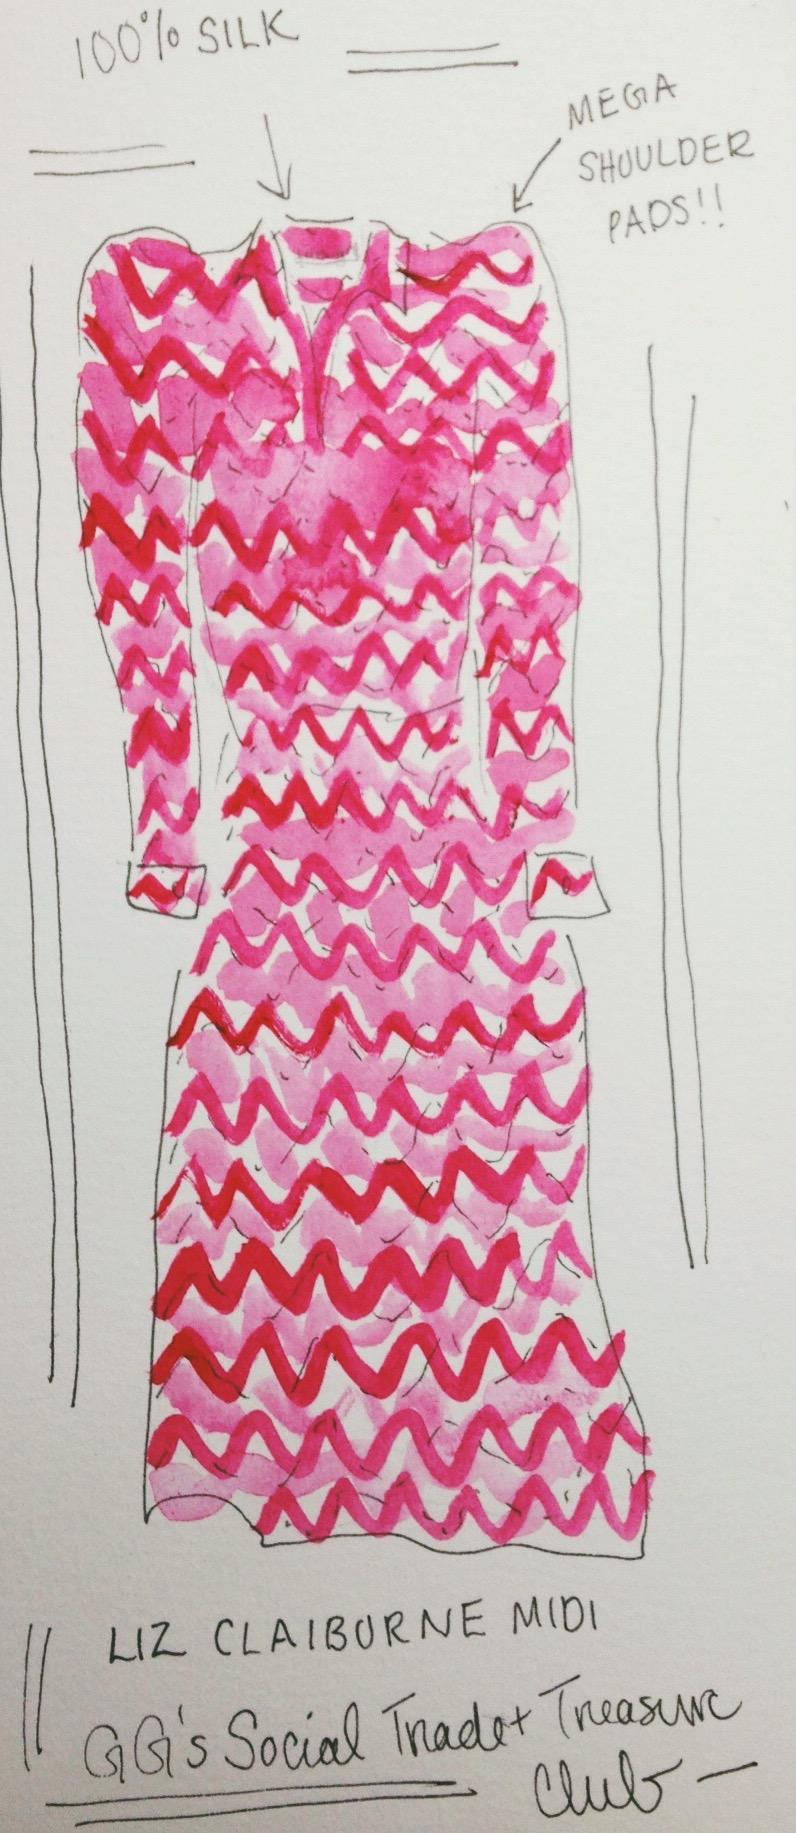 Liz Claiborne silk midi dress